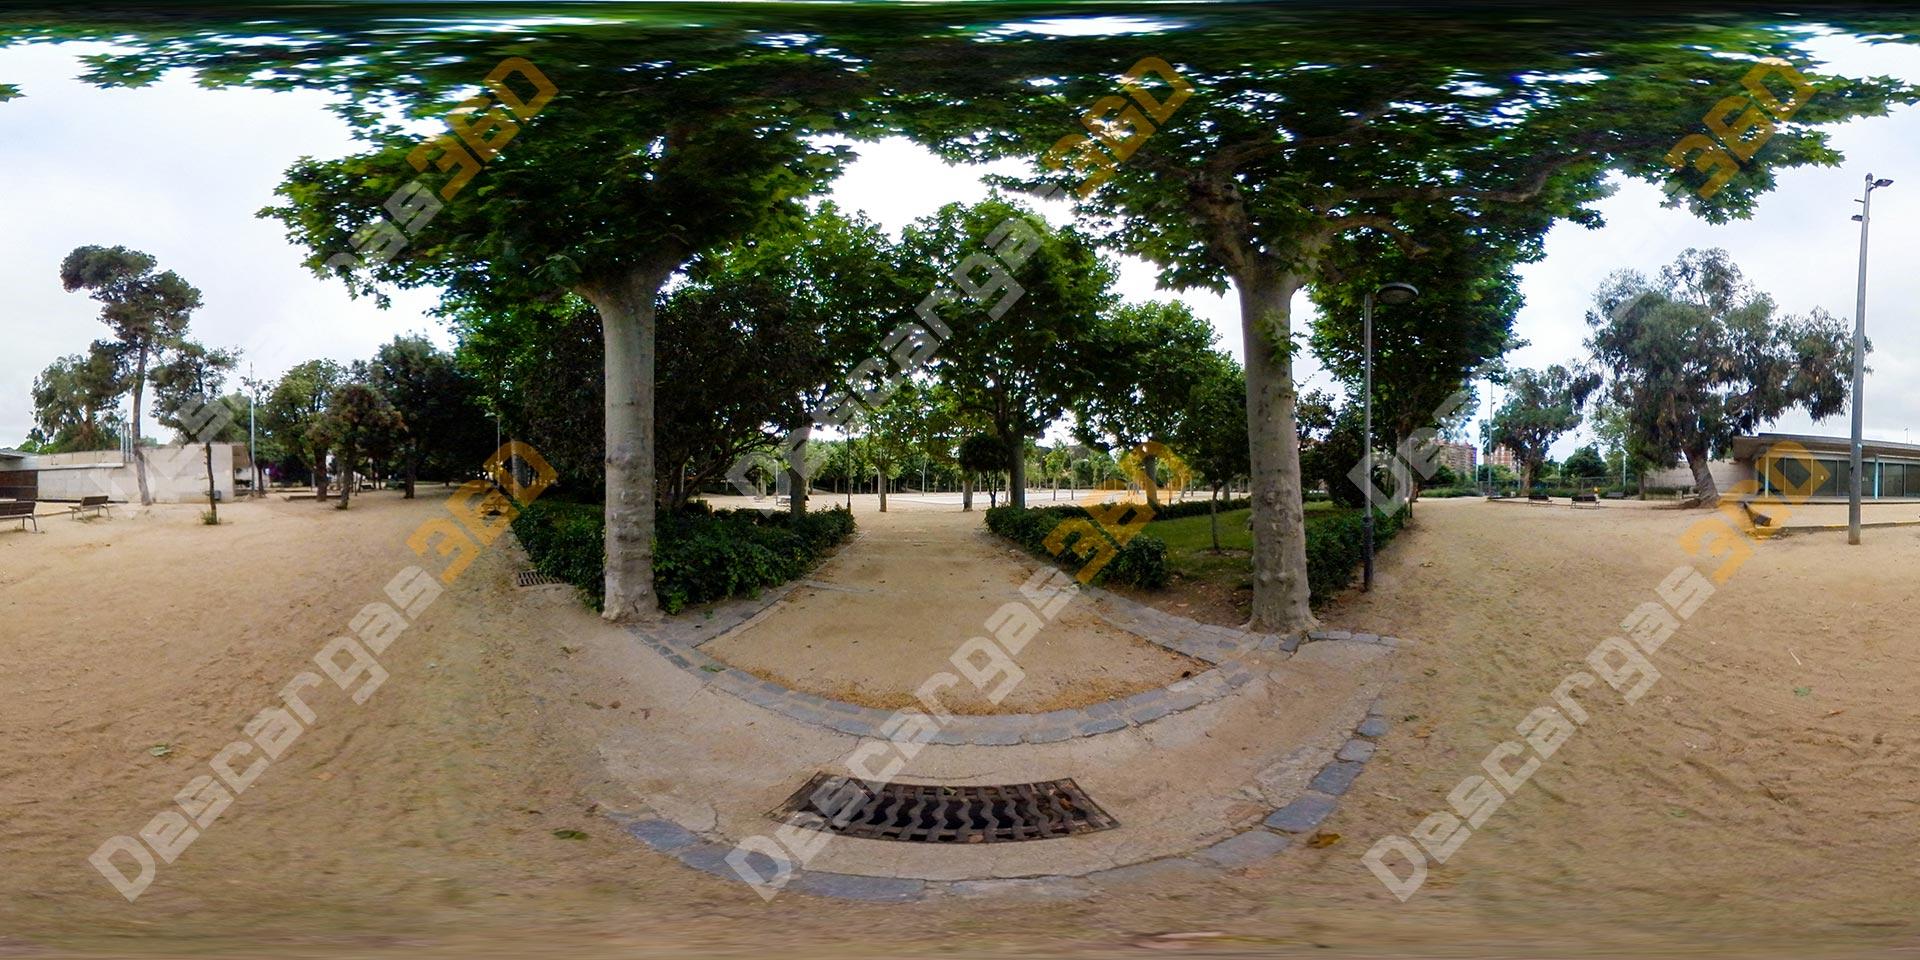 Bifurcación-de-caminos-en-parque-360--Naturaleza---Descargas360_preview